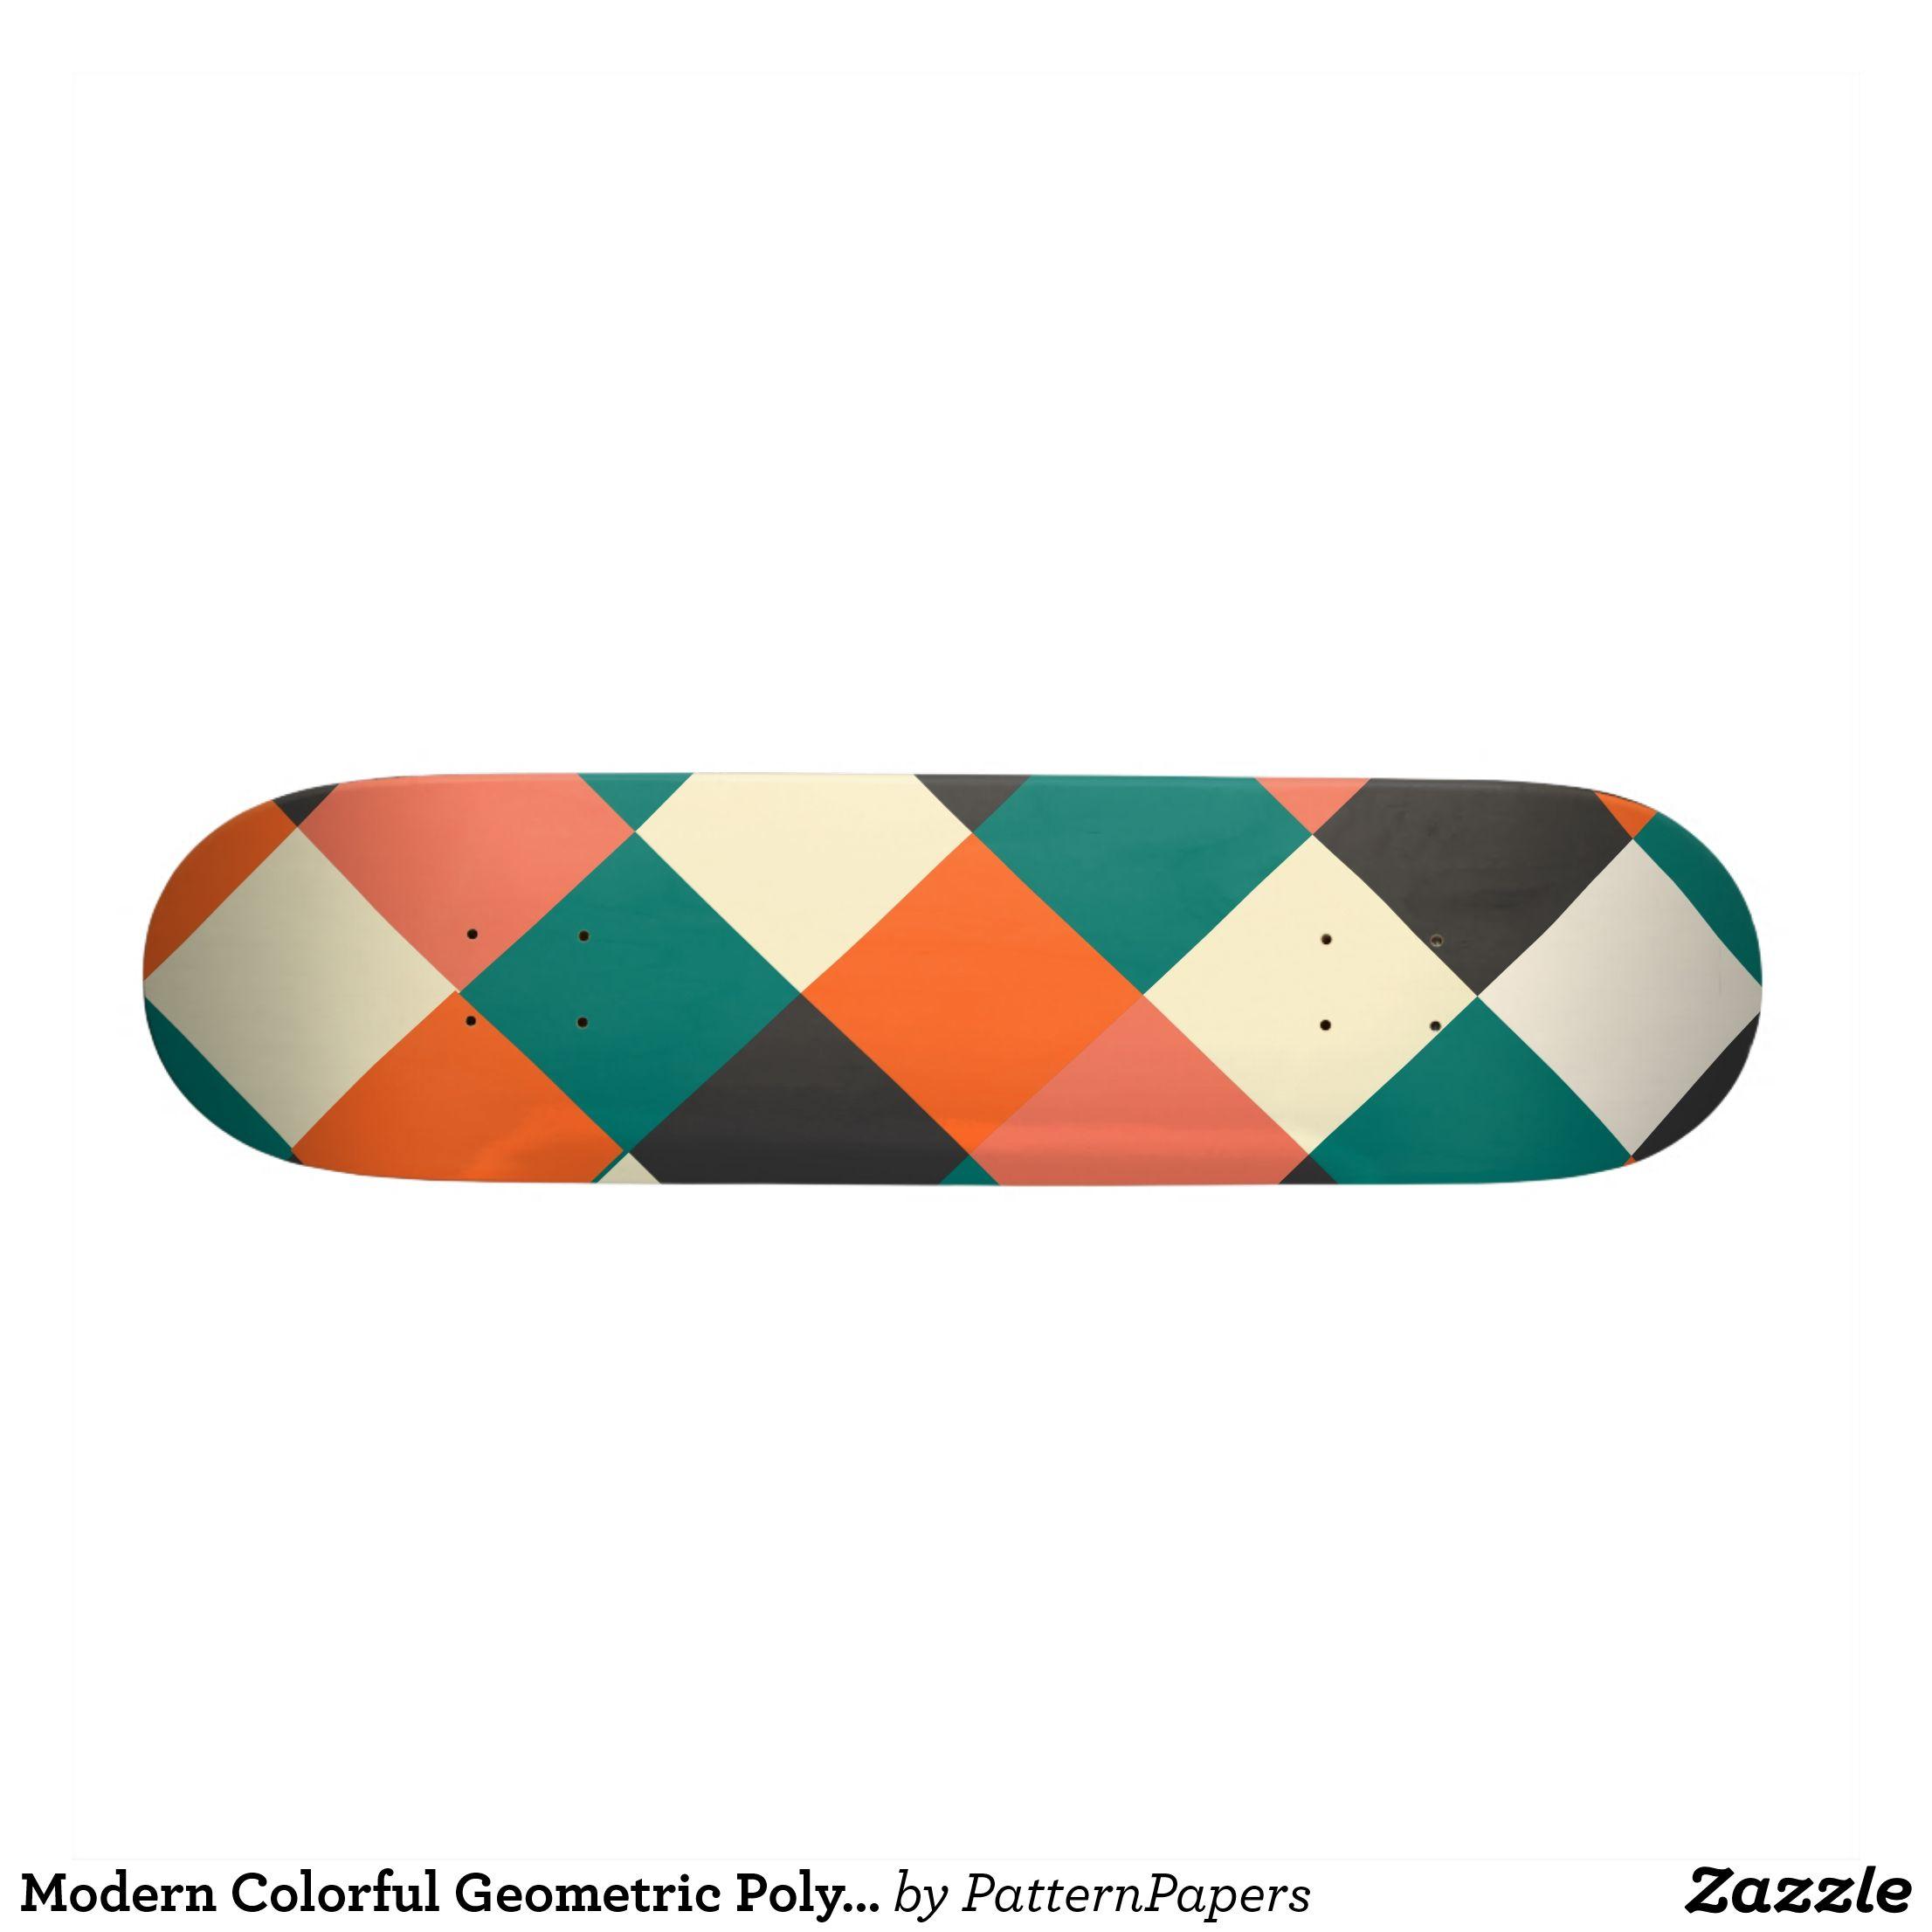 Modern Colorful Geometric Polygon Shapes Mosaic Skateboard Deck Supreme Hard Rock Maple Deck Custom Boards By Talented Fa Polygon Shape Geometric Skateboards